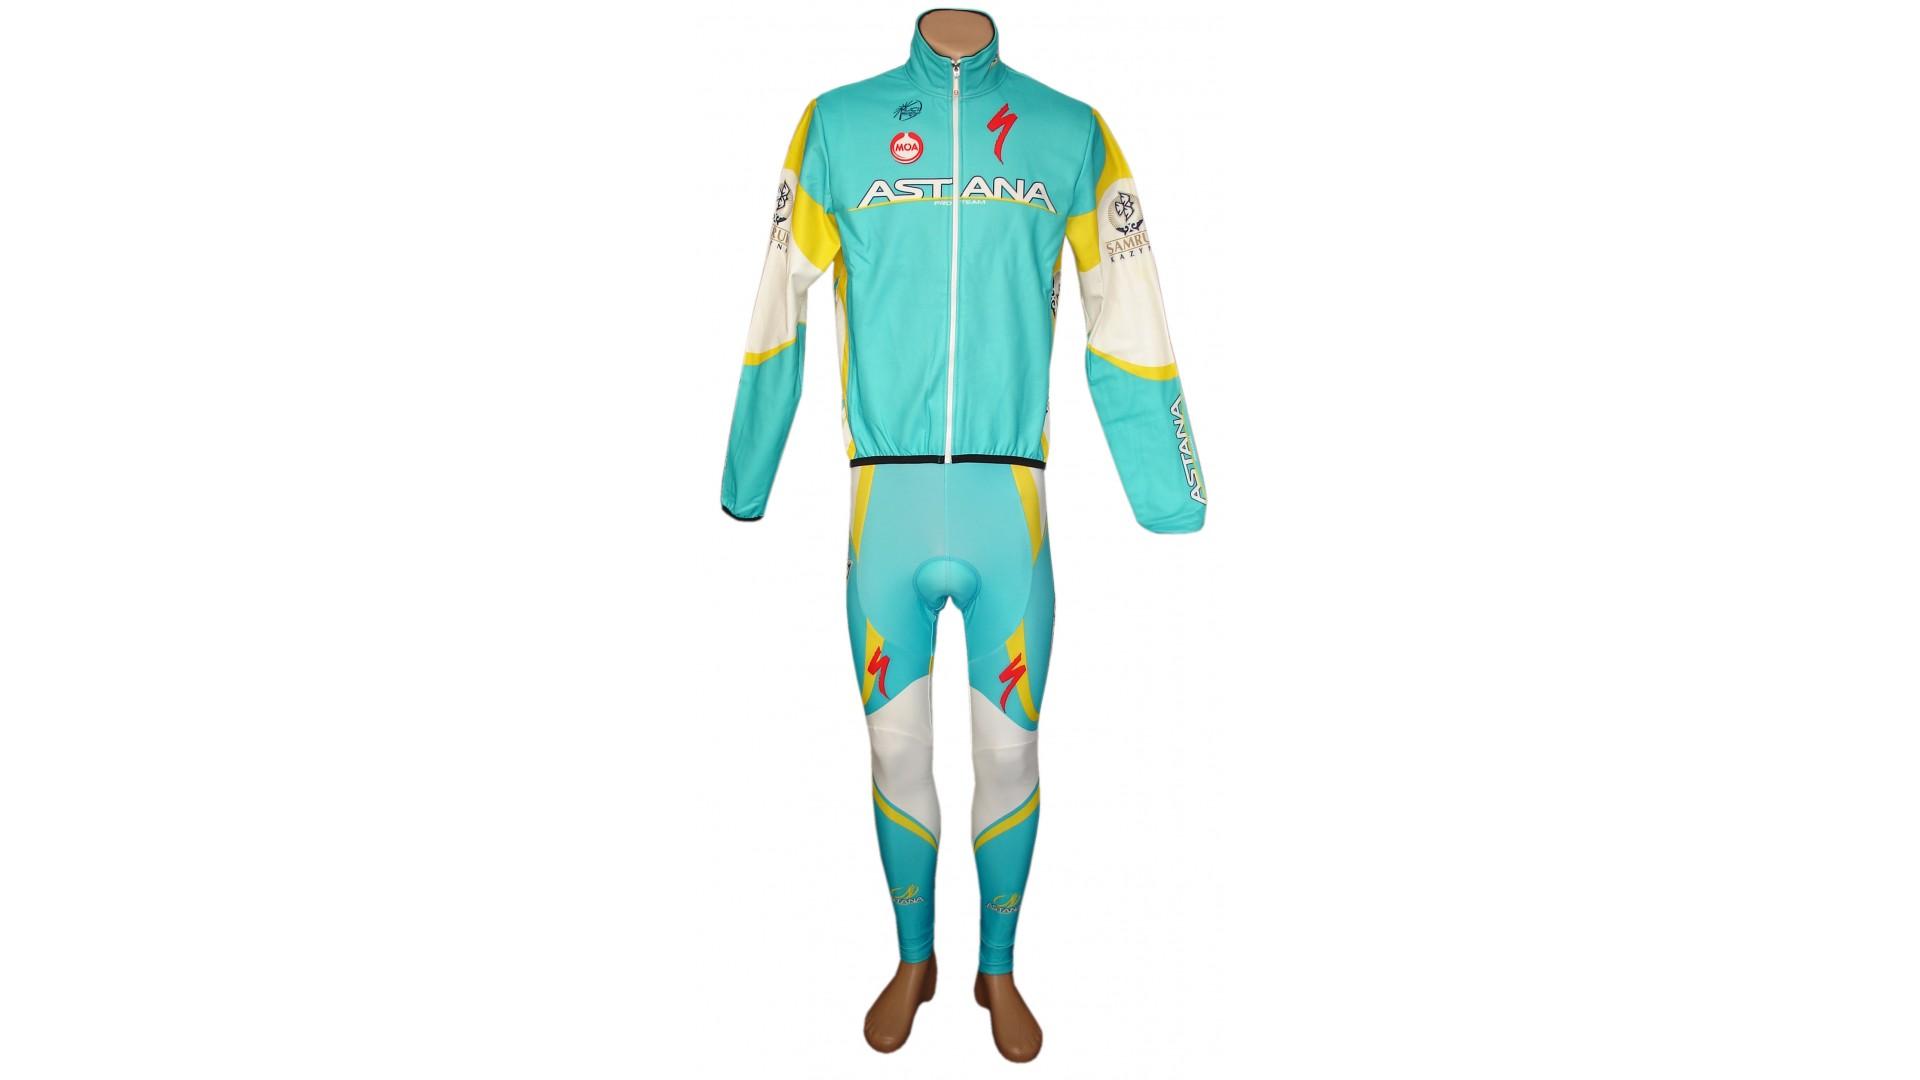 Велокуртка Nalini Astana зимняя общий вид спереди